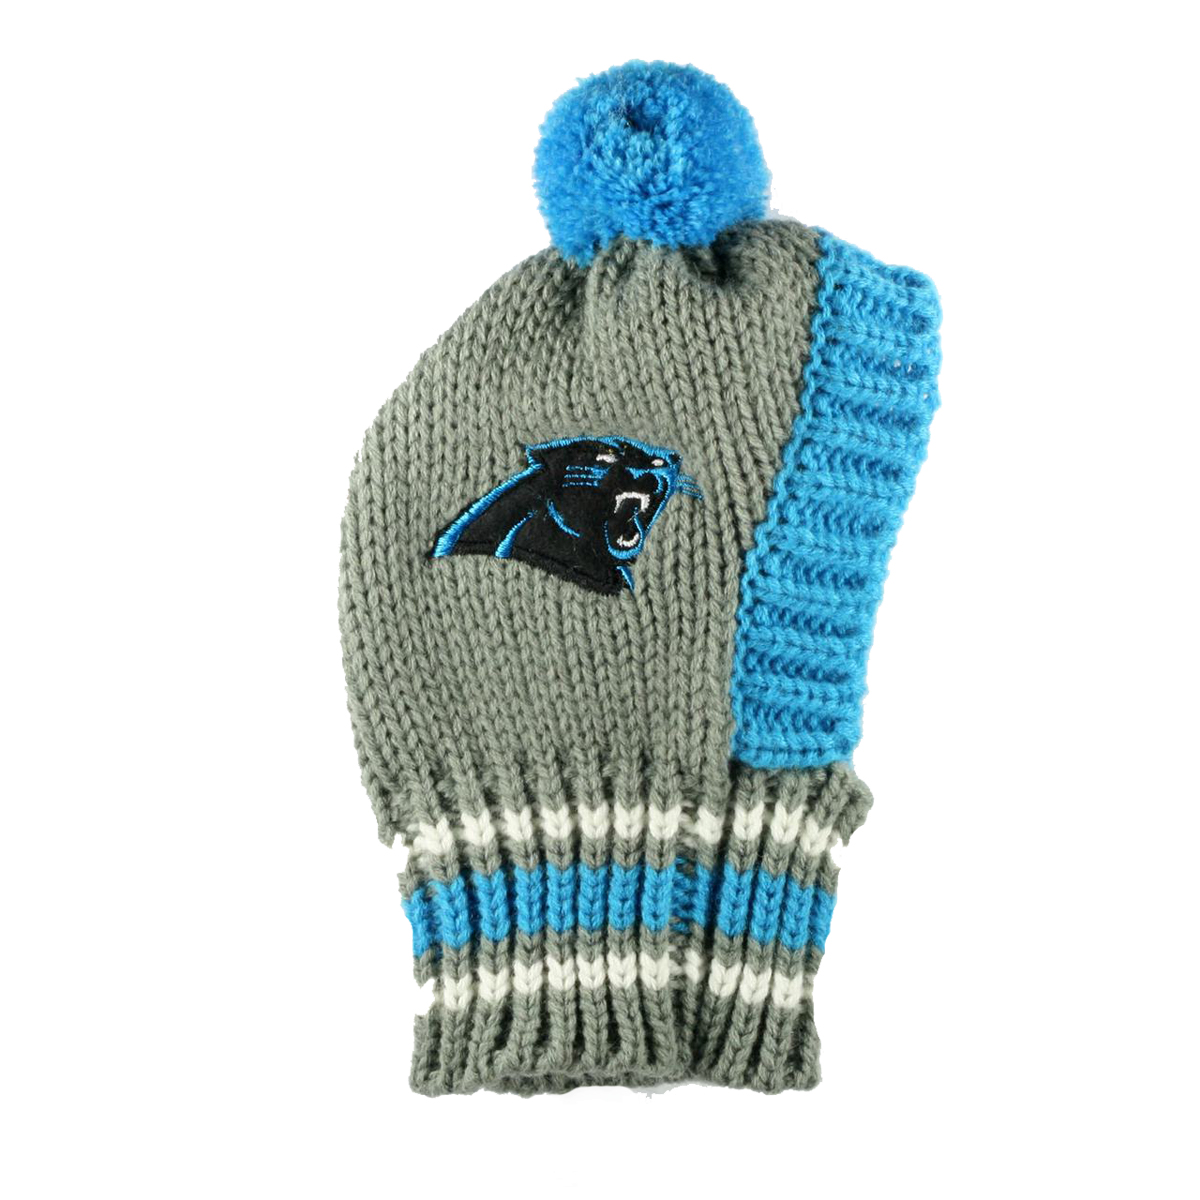 Knitting Patterns For Dog Hats : Carolina Panthers Knit Dog Hat BaxterBoo